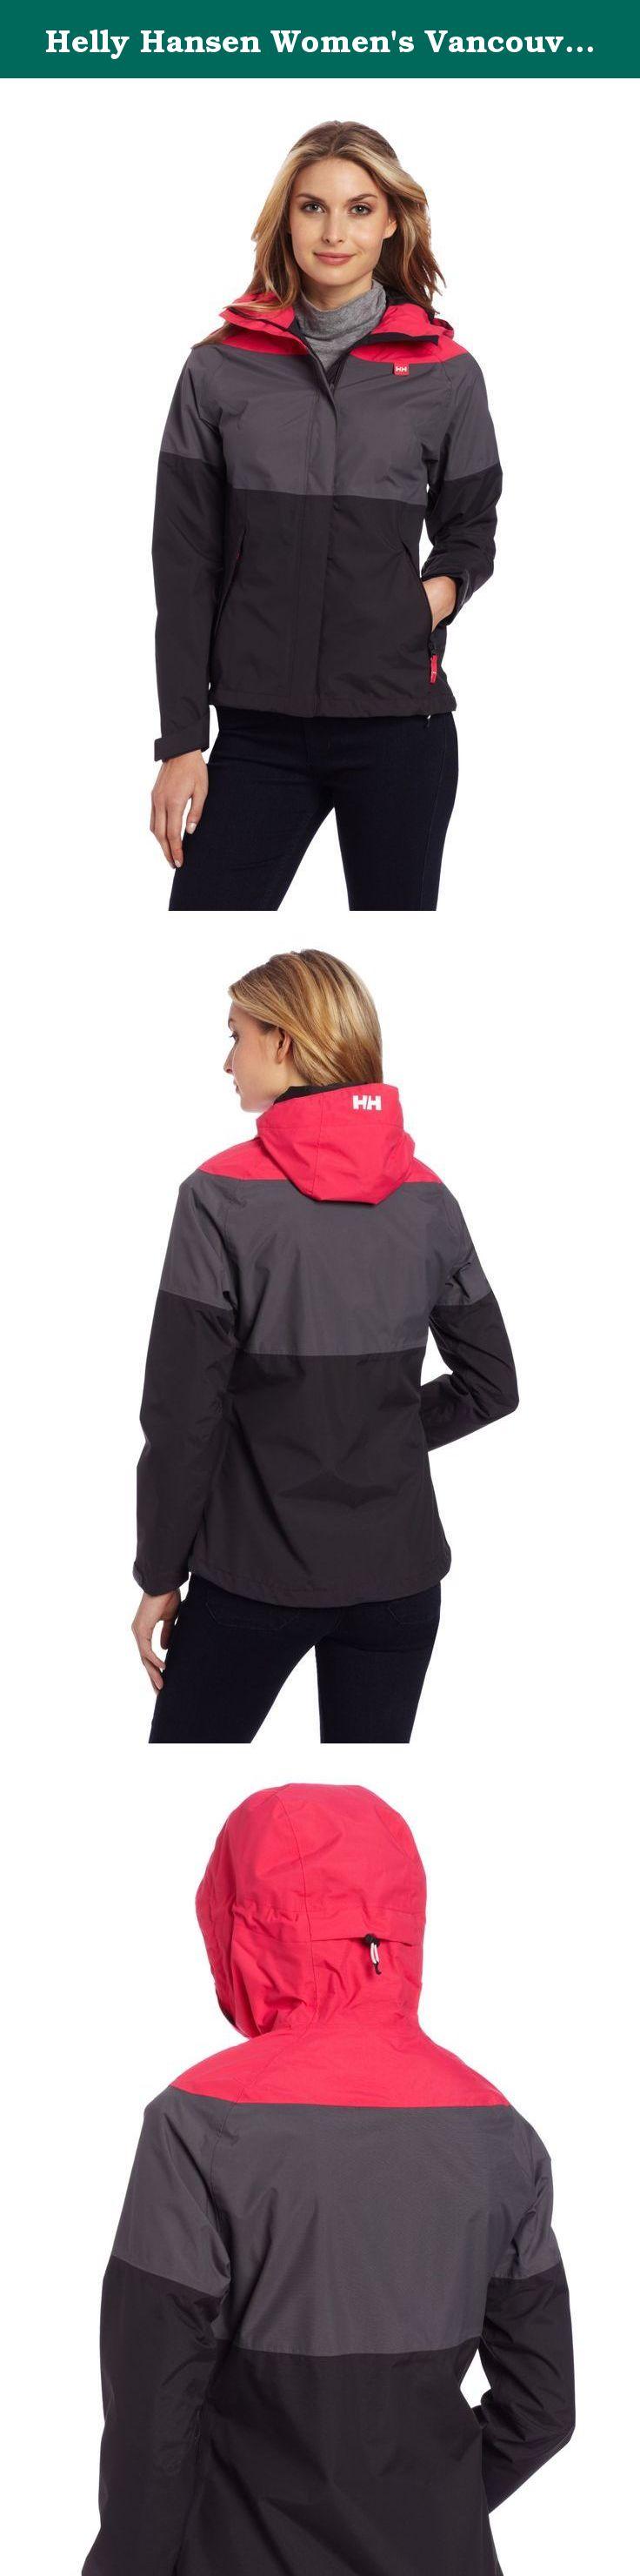 Helly hansen women's vancouver tricolor rain jacket